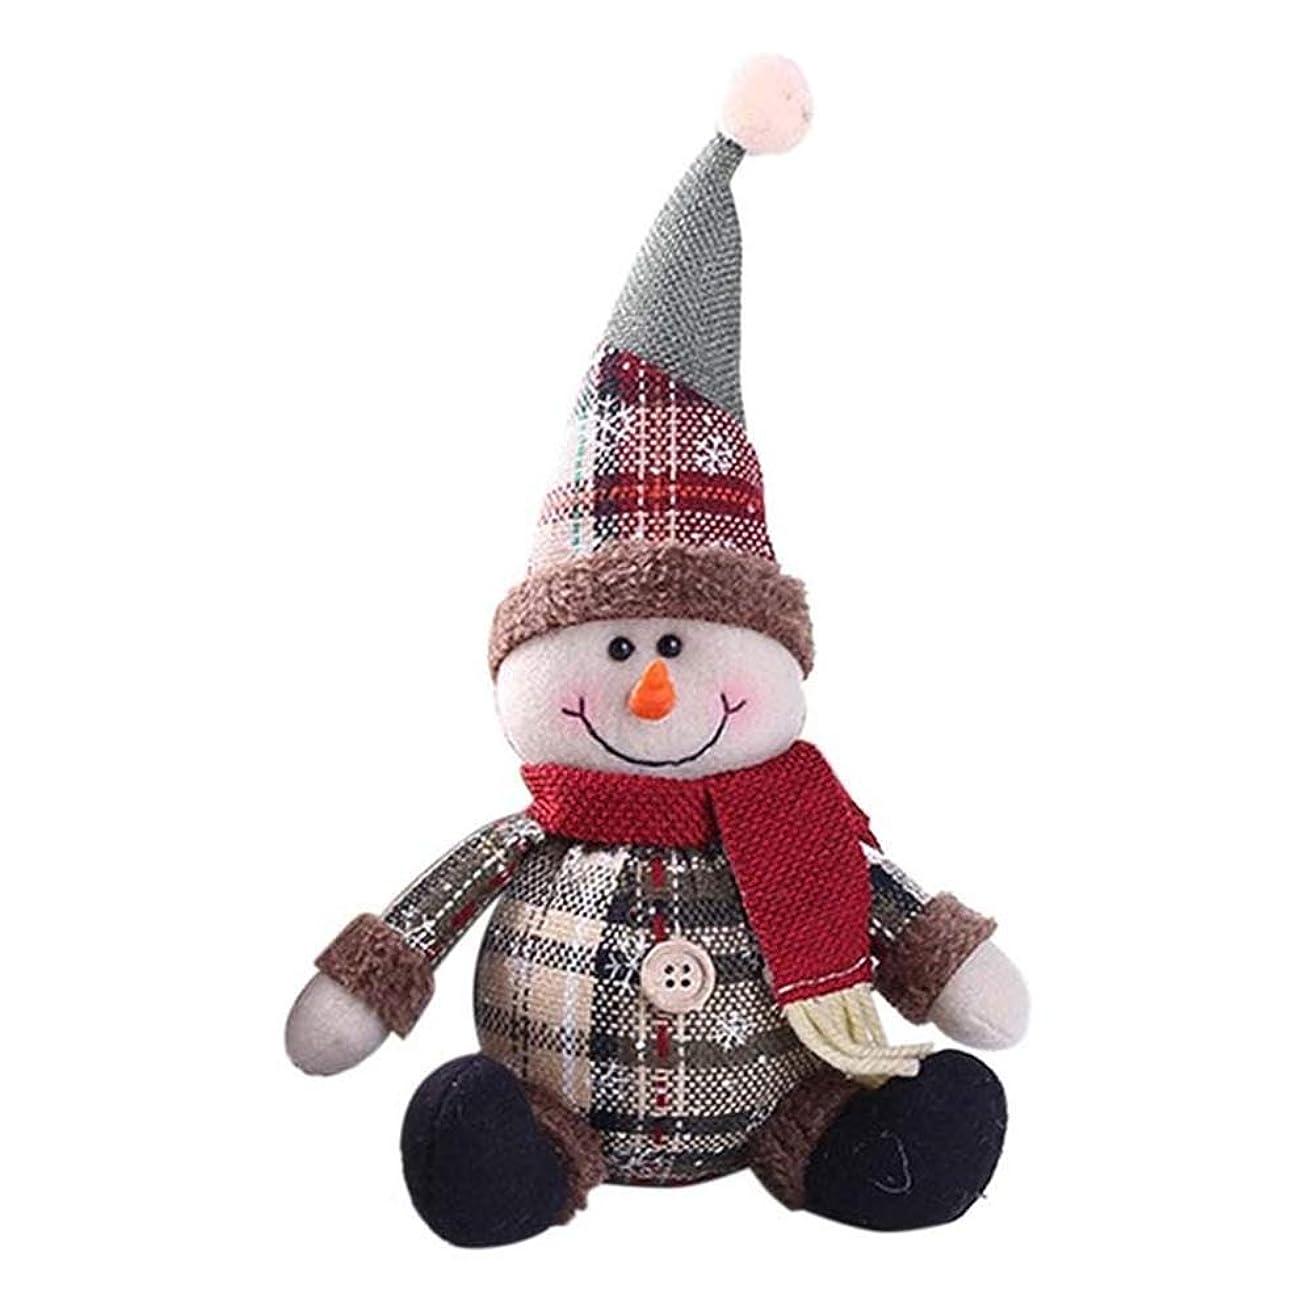 Grokebo クリスマスツリー 人形 ぬいぐるみ ぶら下げ装飾 壁掛け 玄関飾り インテリア おもちゃ クリスマス 人形 飾り 人形装飾 クリスマス雰囲気満載 パーティー飾り クリスマスギフト クリスマス装飾